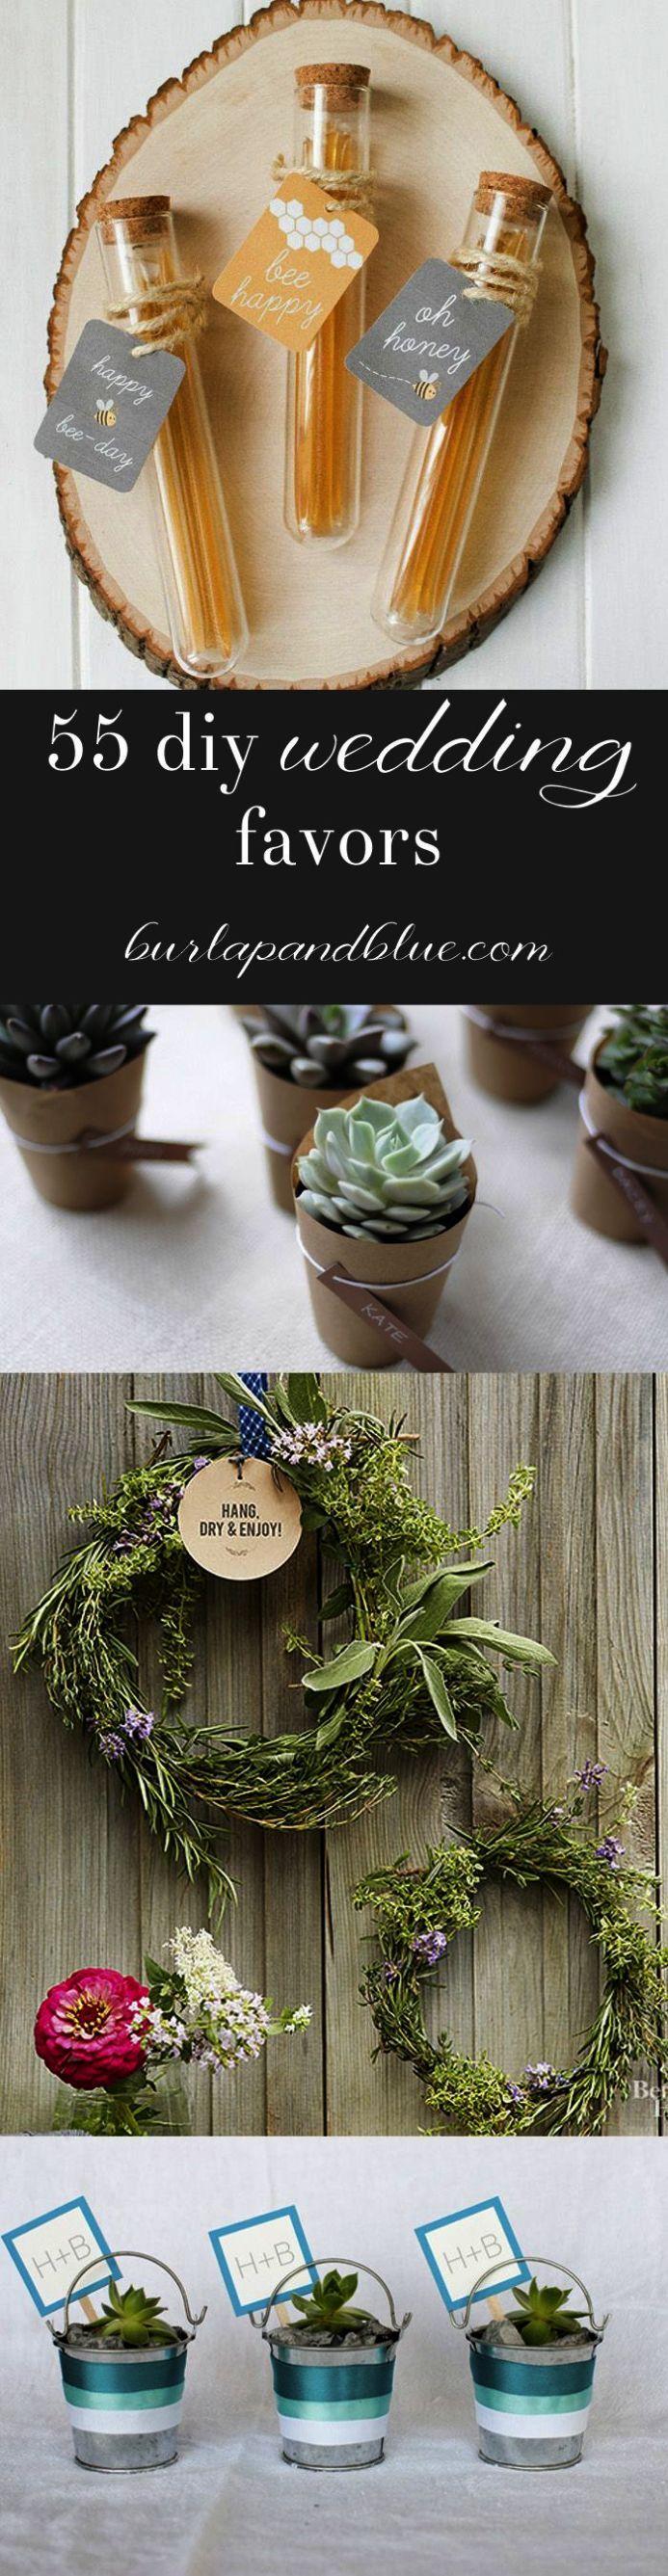 DIY Honey Jar Wedding Favors Personalized Wedding Favors Near Me